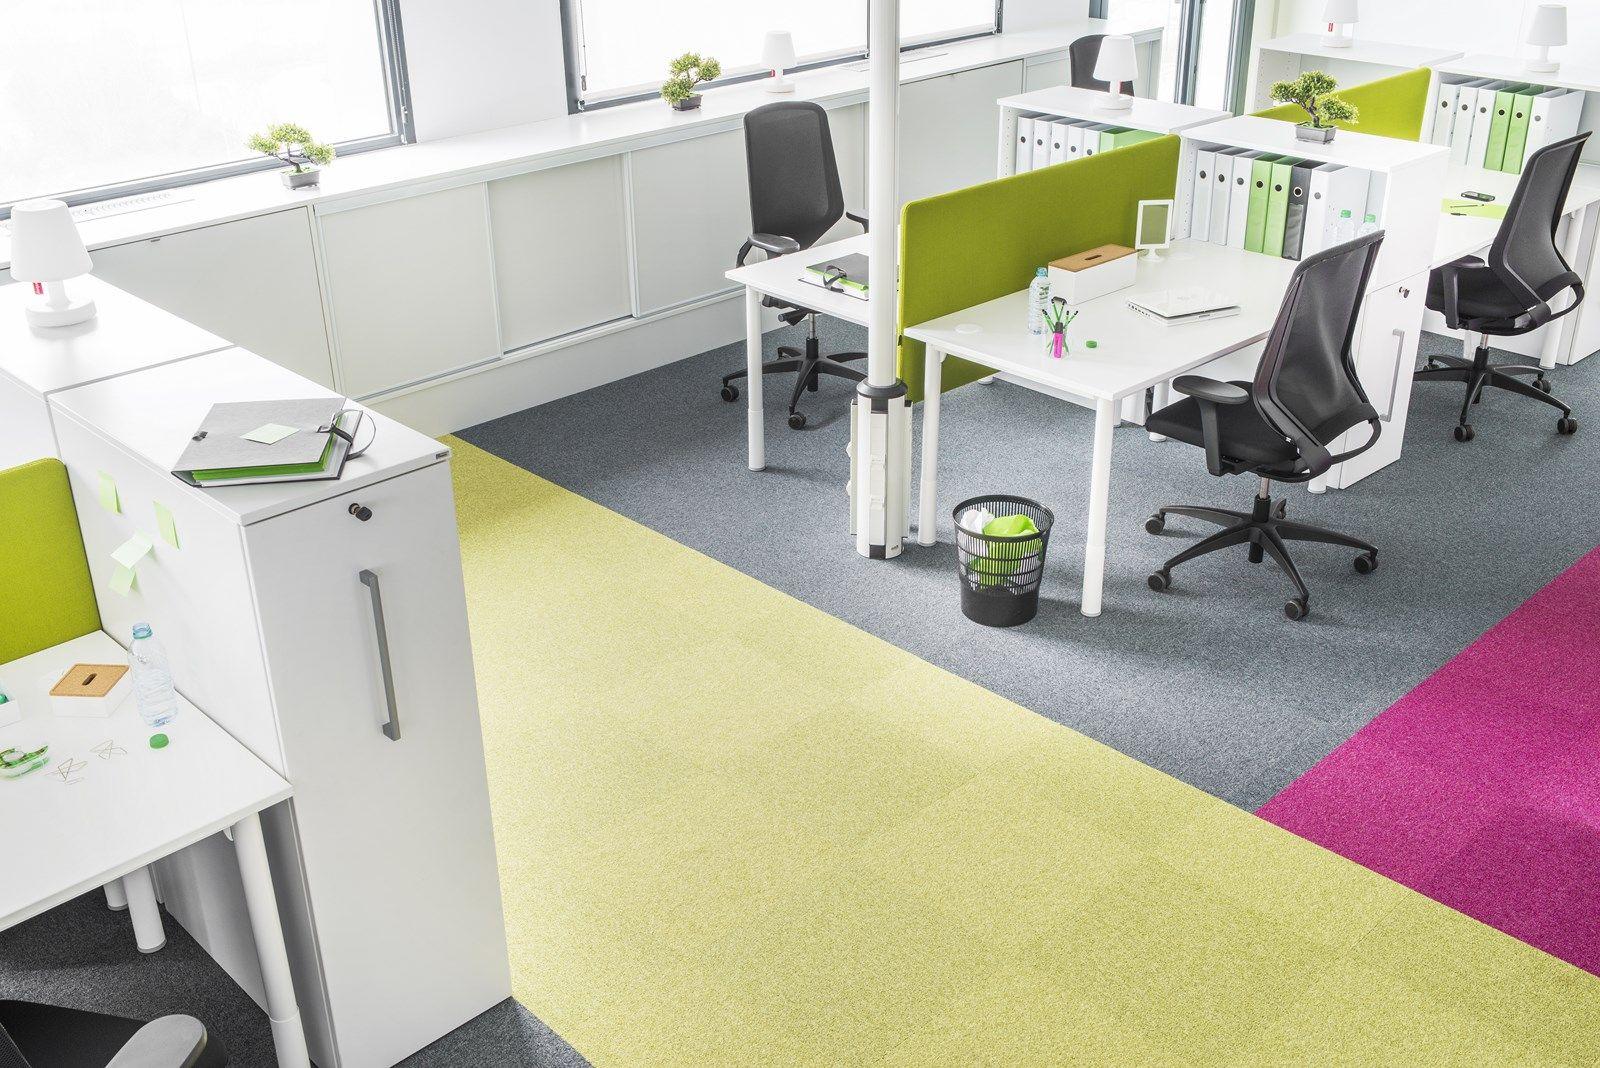 Bureaux kinnarps inspiration bureaux inspiration